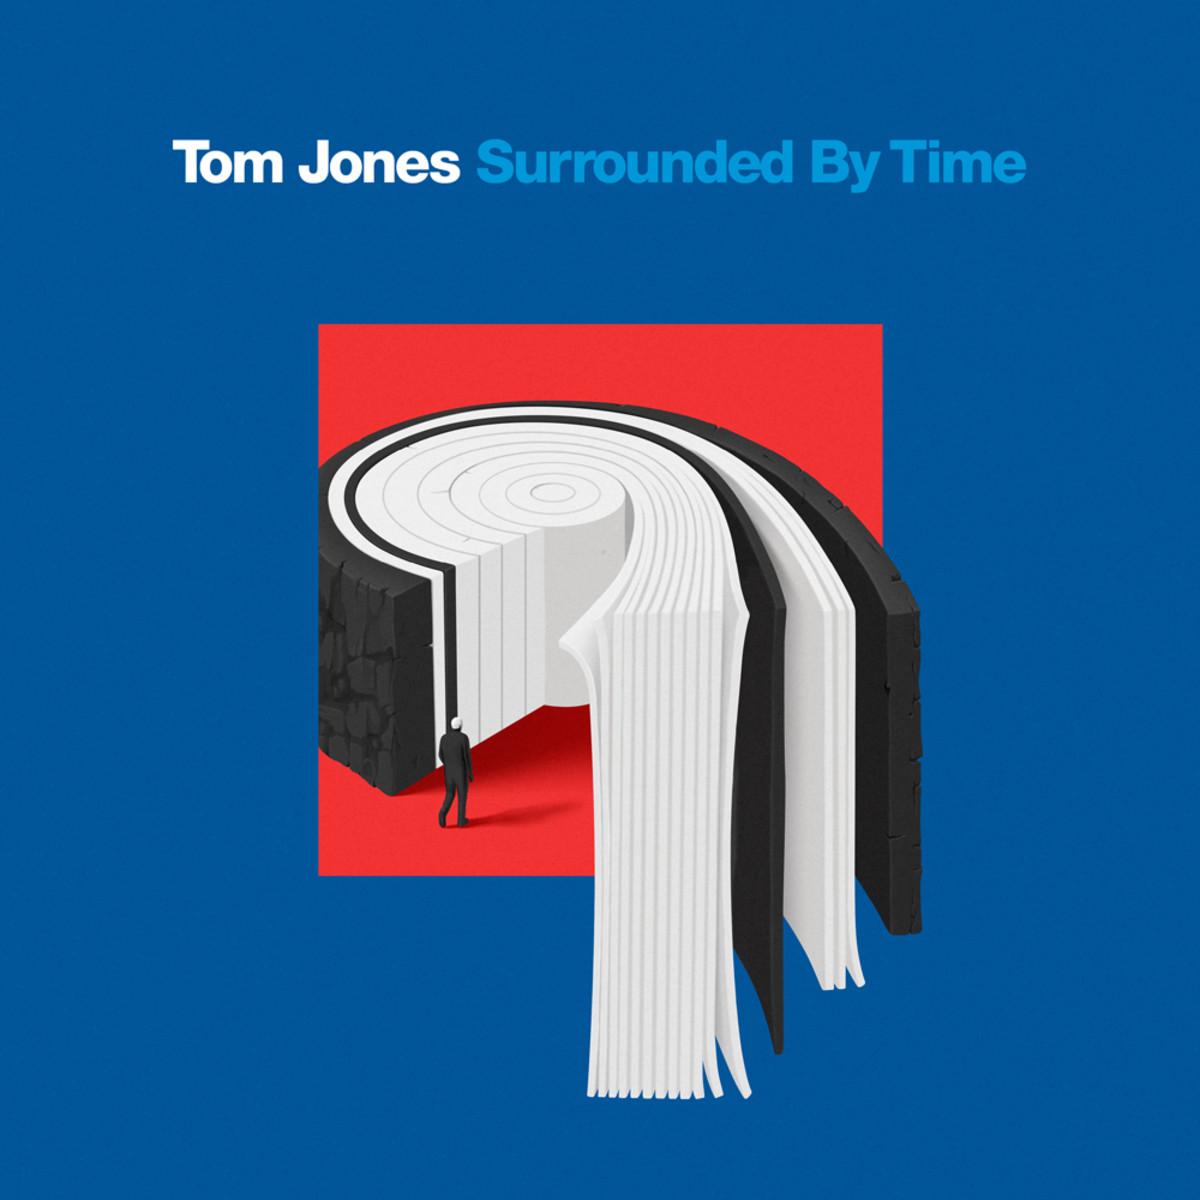 TomJones_SurroundedByTime